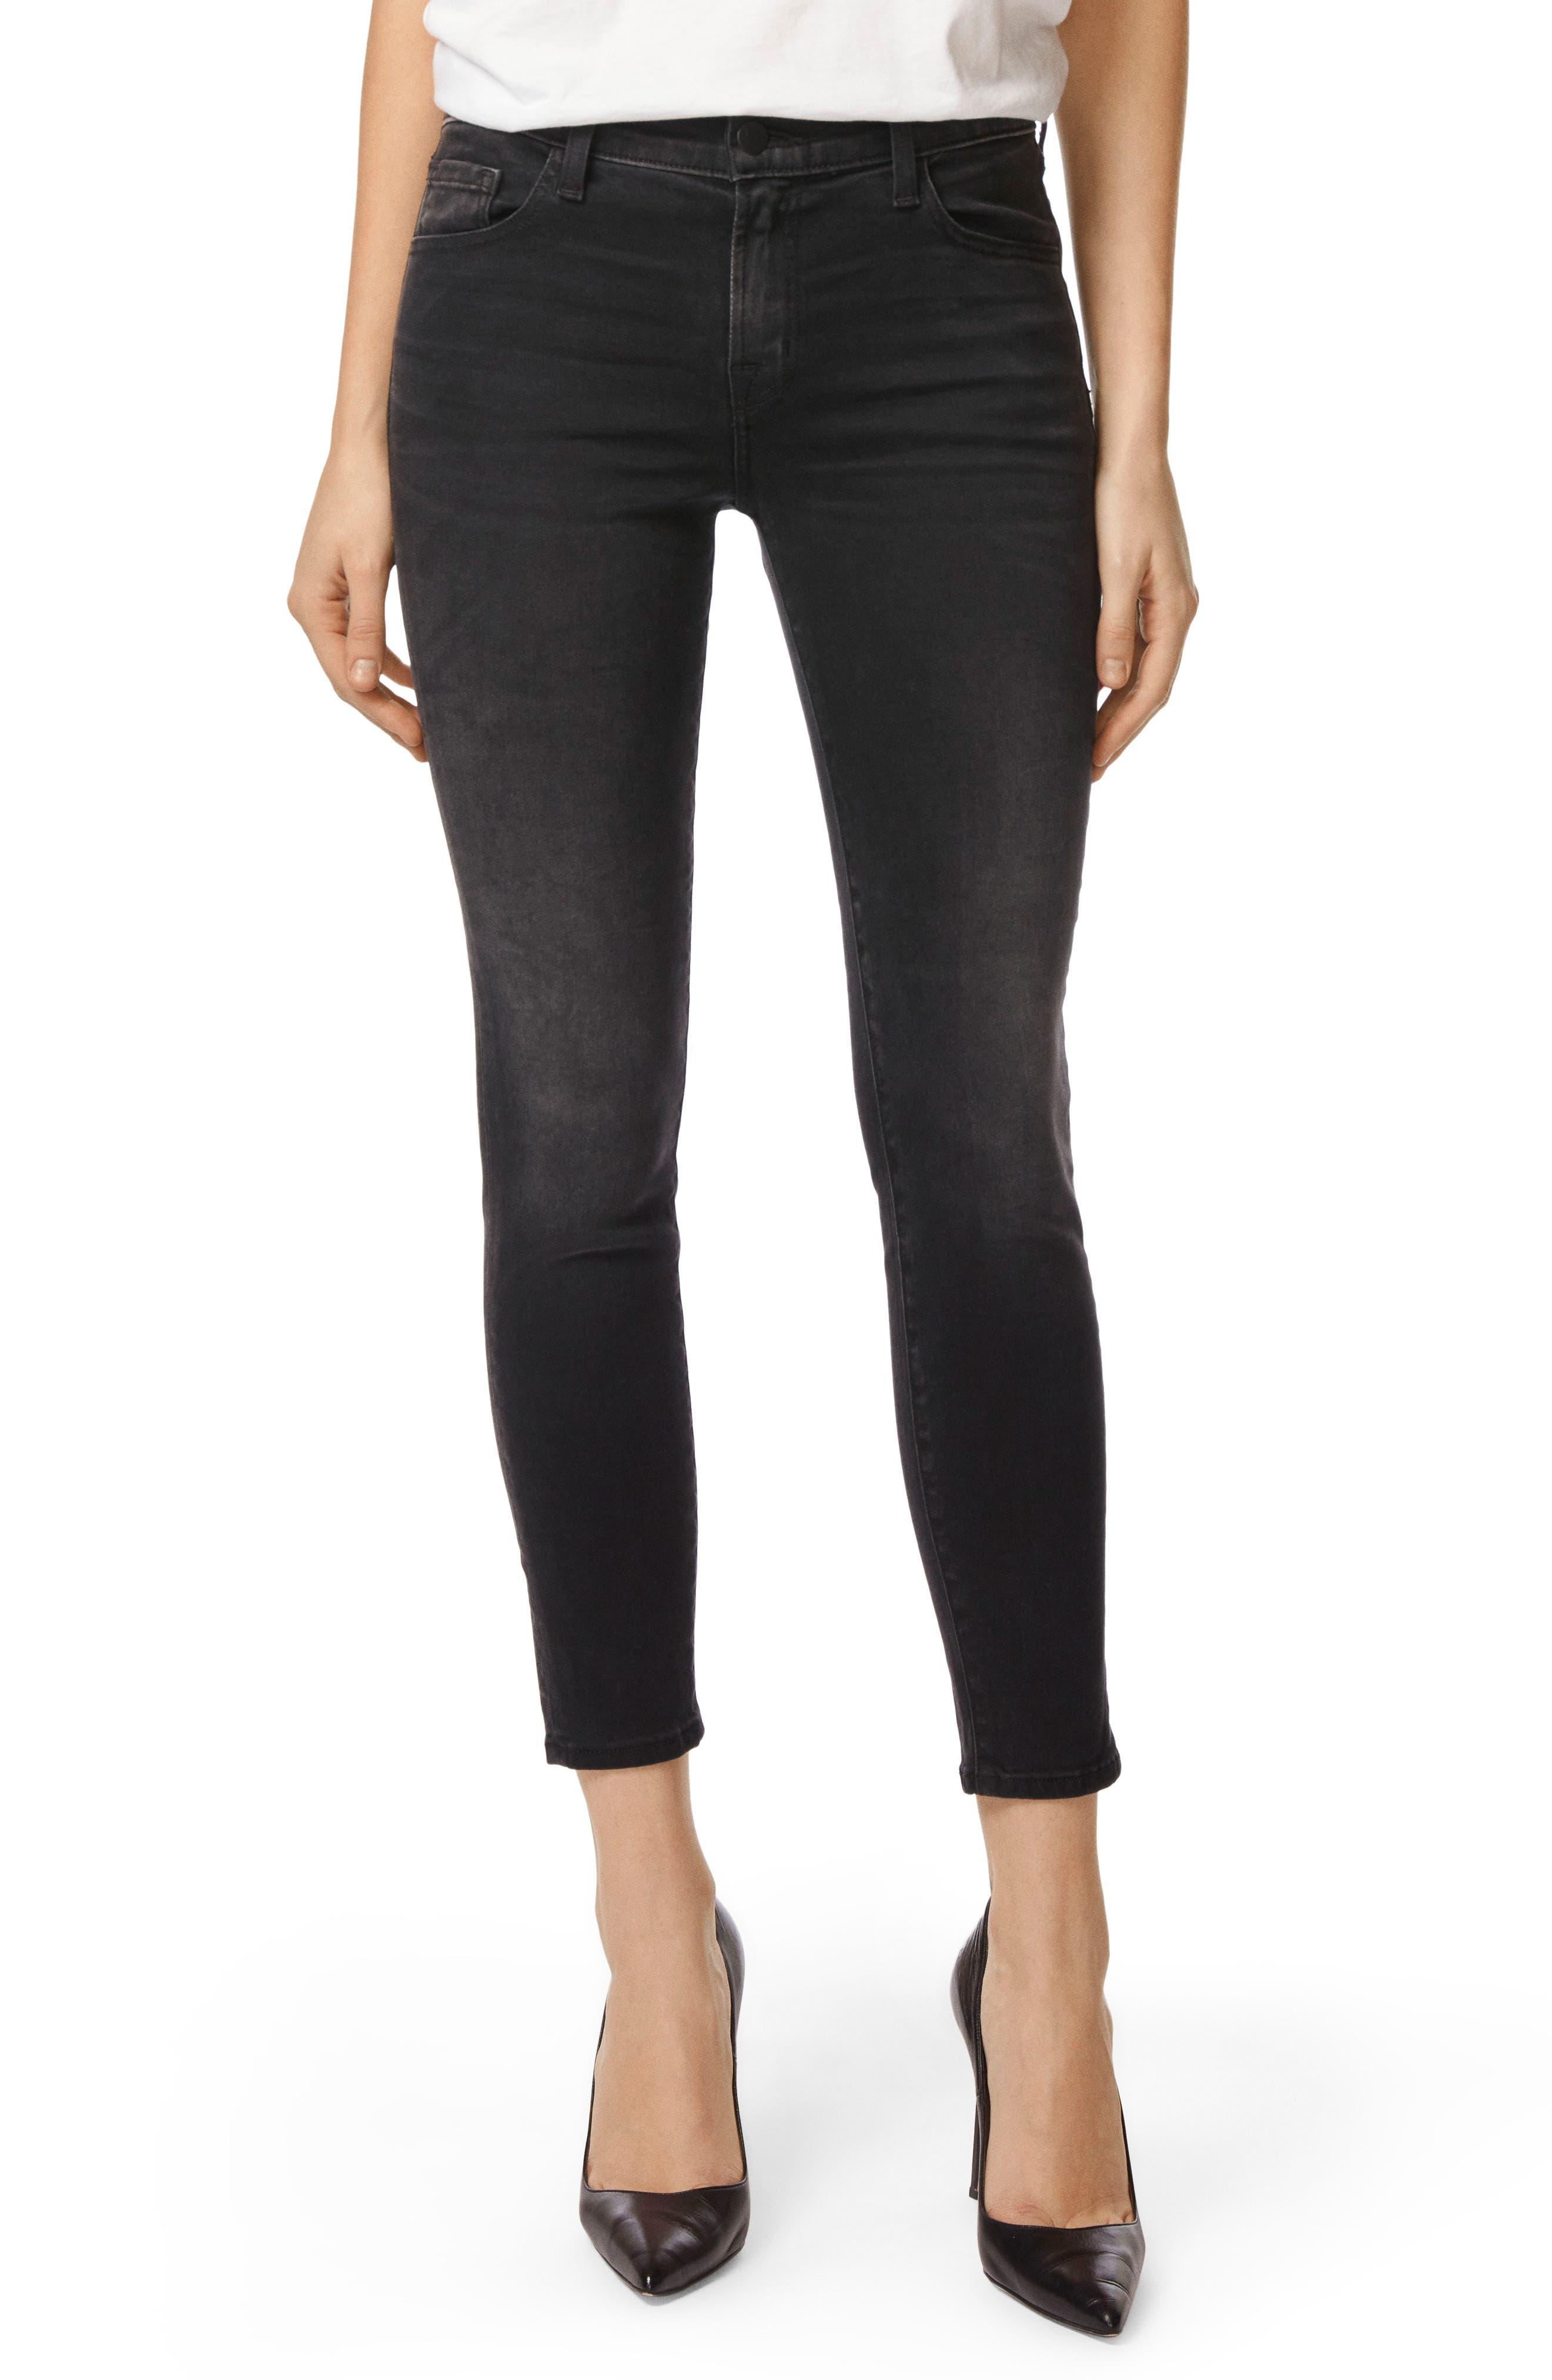 Capri Skinny Jeans,                             Main thumbnail 1, color,                             001